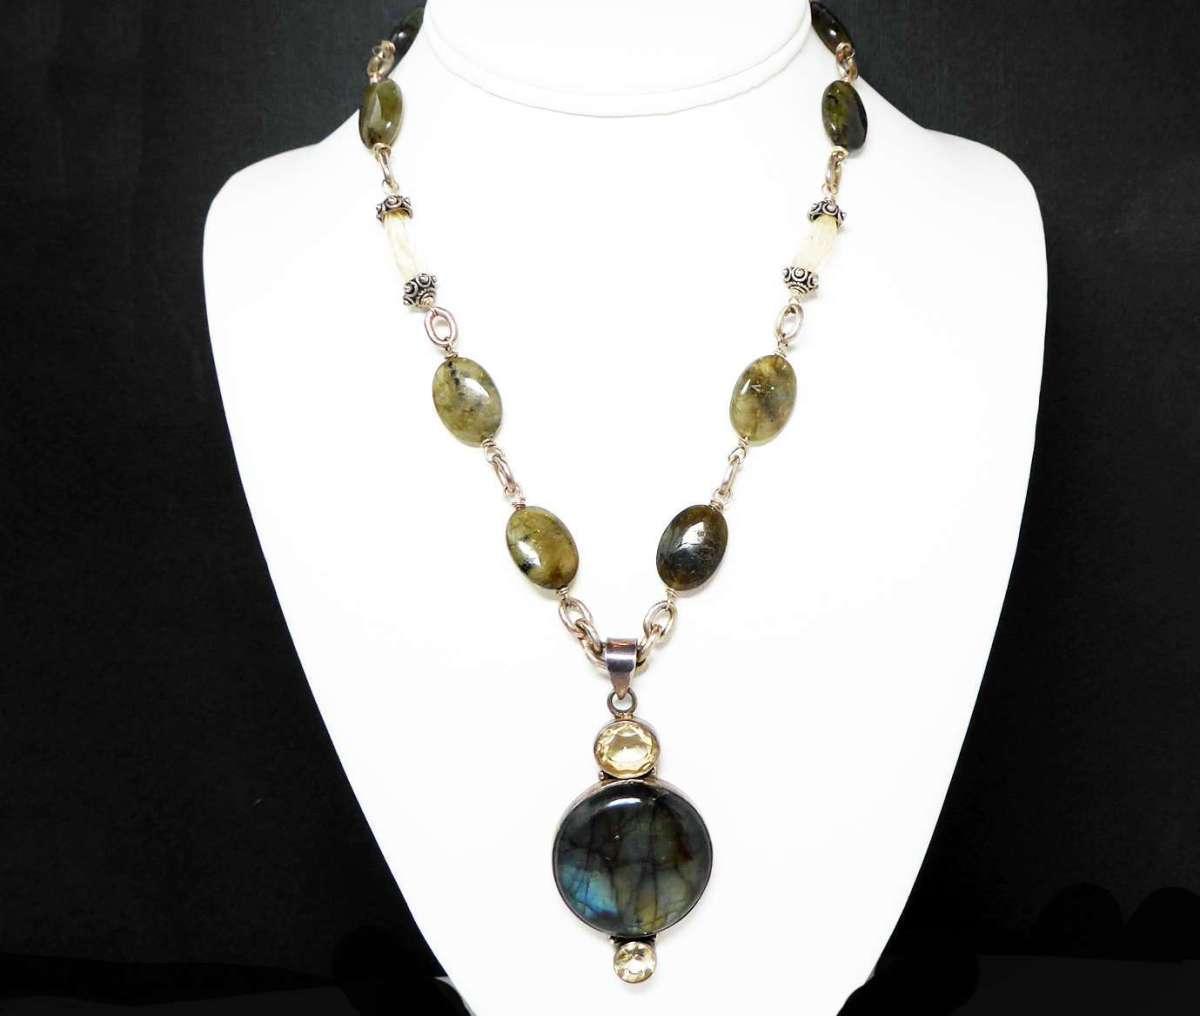 Sterling Silver & Gemstones Pendant Necklace – Iridescent Blue Green Labradorite Gemstone with Faceted Citrine – Vintage Jewelry Signed 925 http://dlvr.it/RQbgk0pic.twitter.com/KSRftJfpyJ